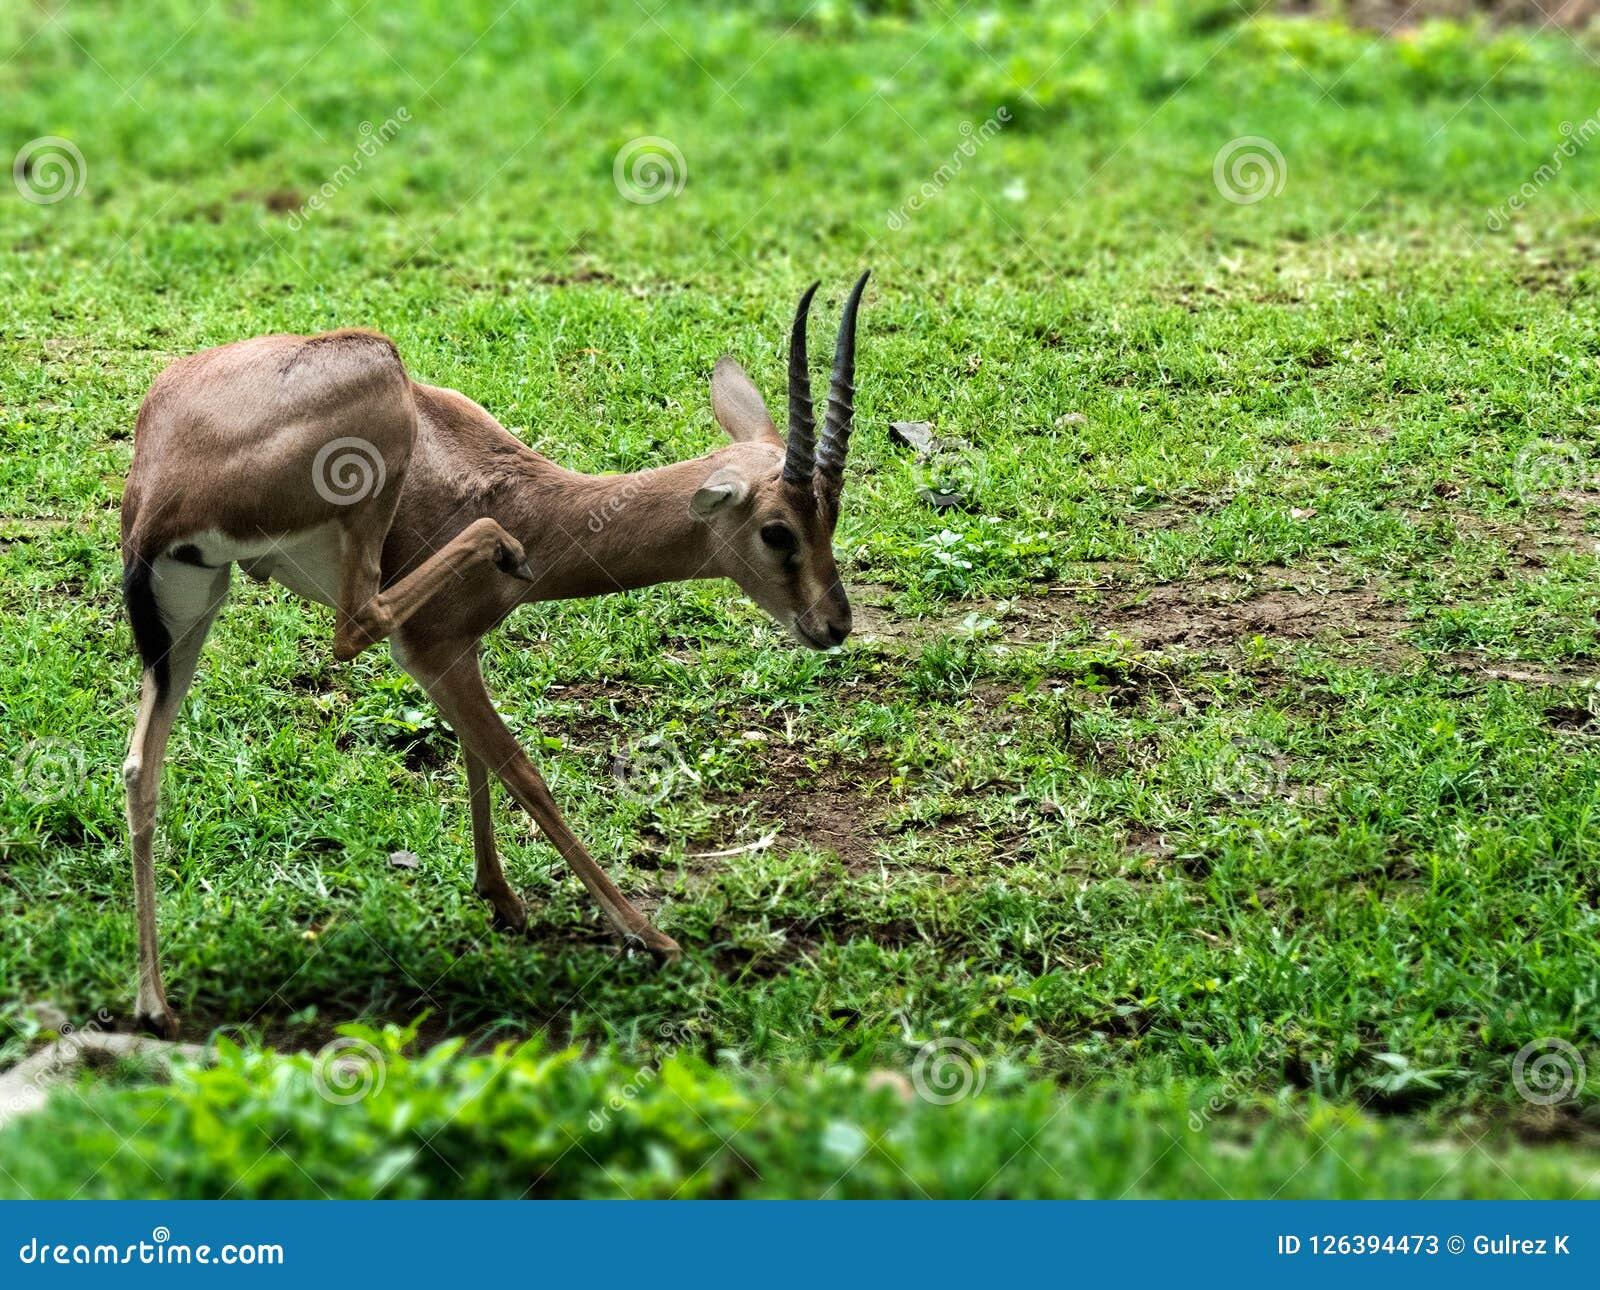 Indian Gazelle or Chinkara stock image  Image of chinkara - 126394473